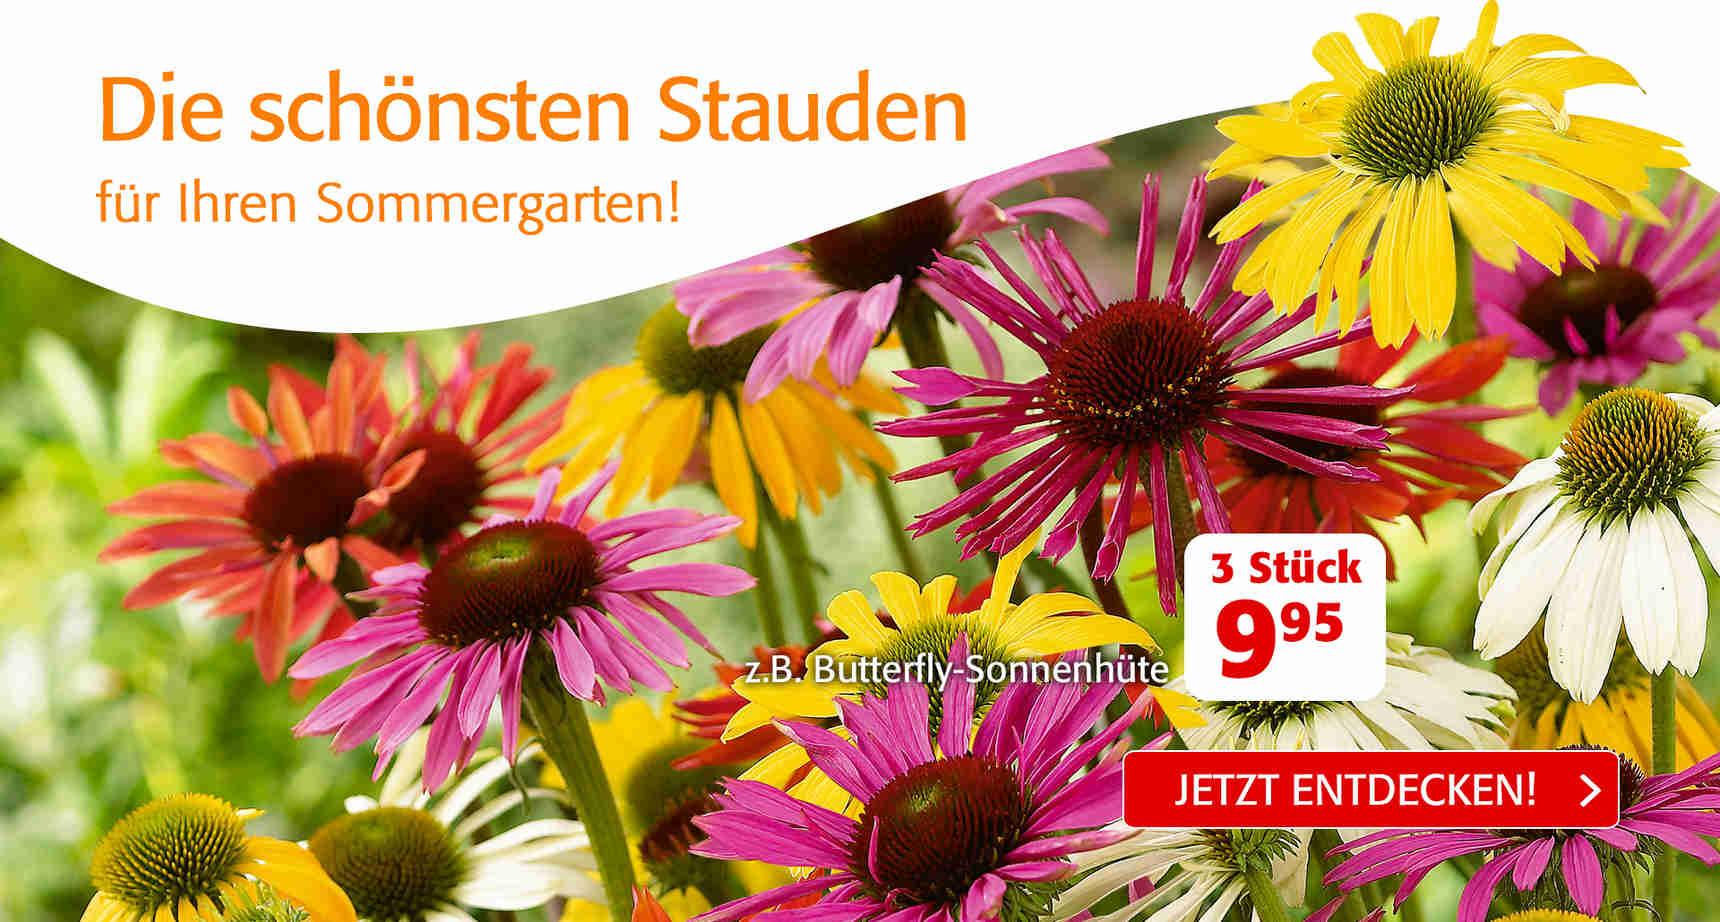 +++ (1) Sommerstauden +++ - 3